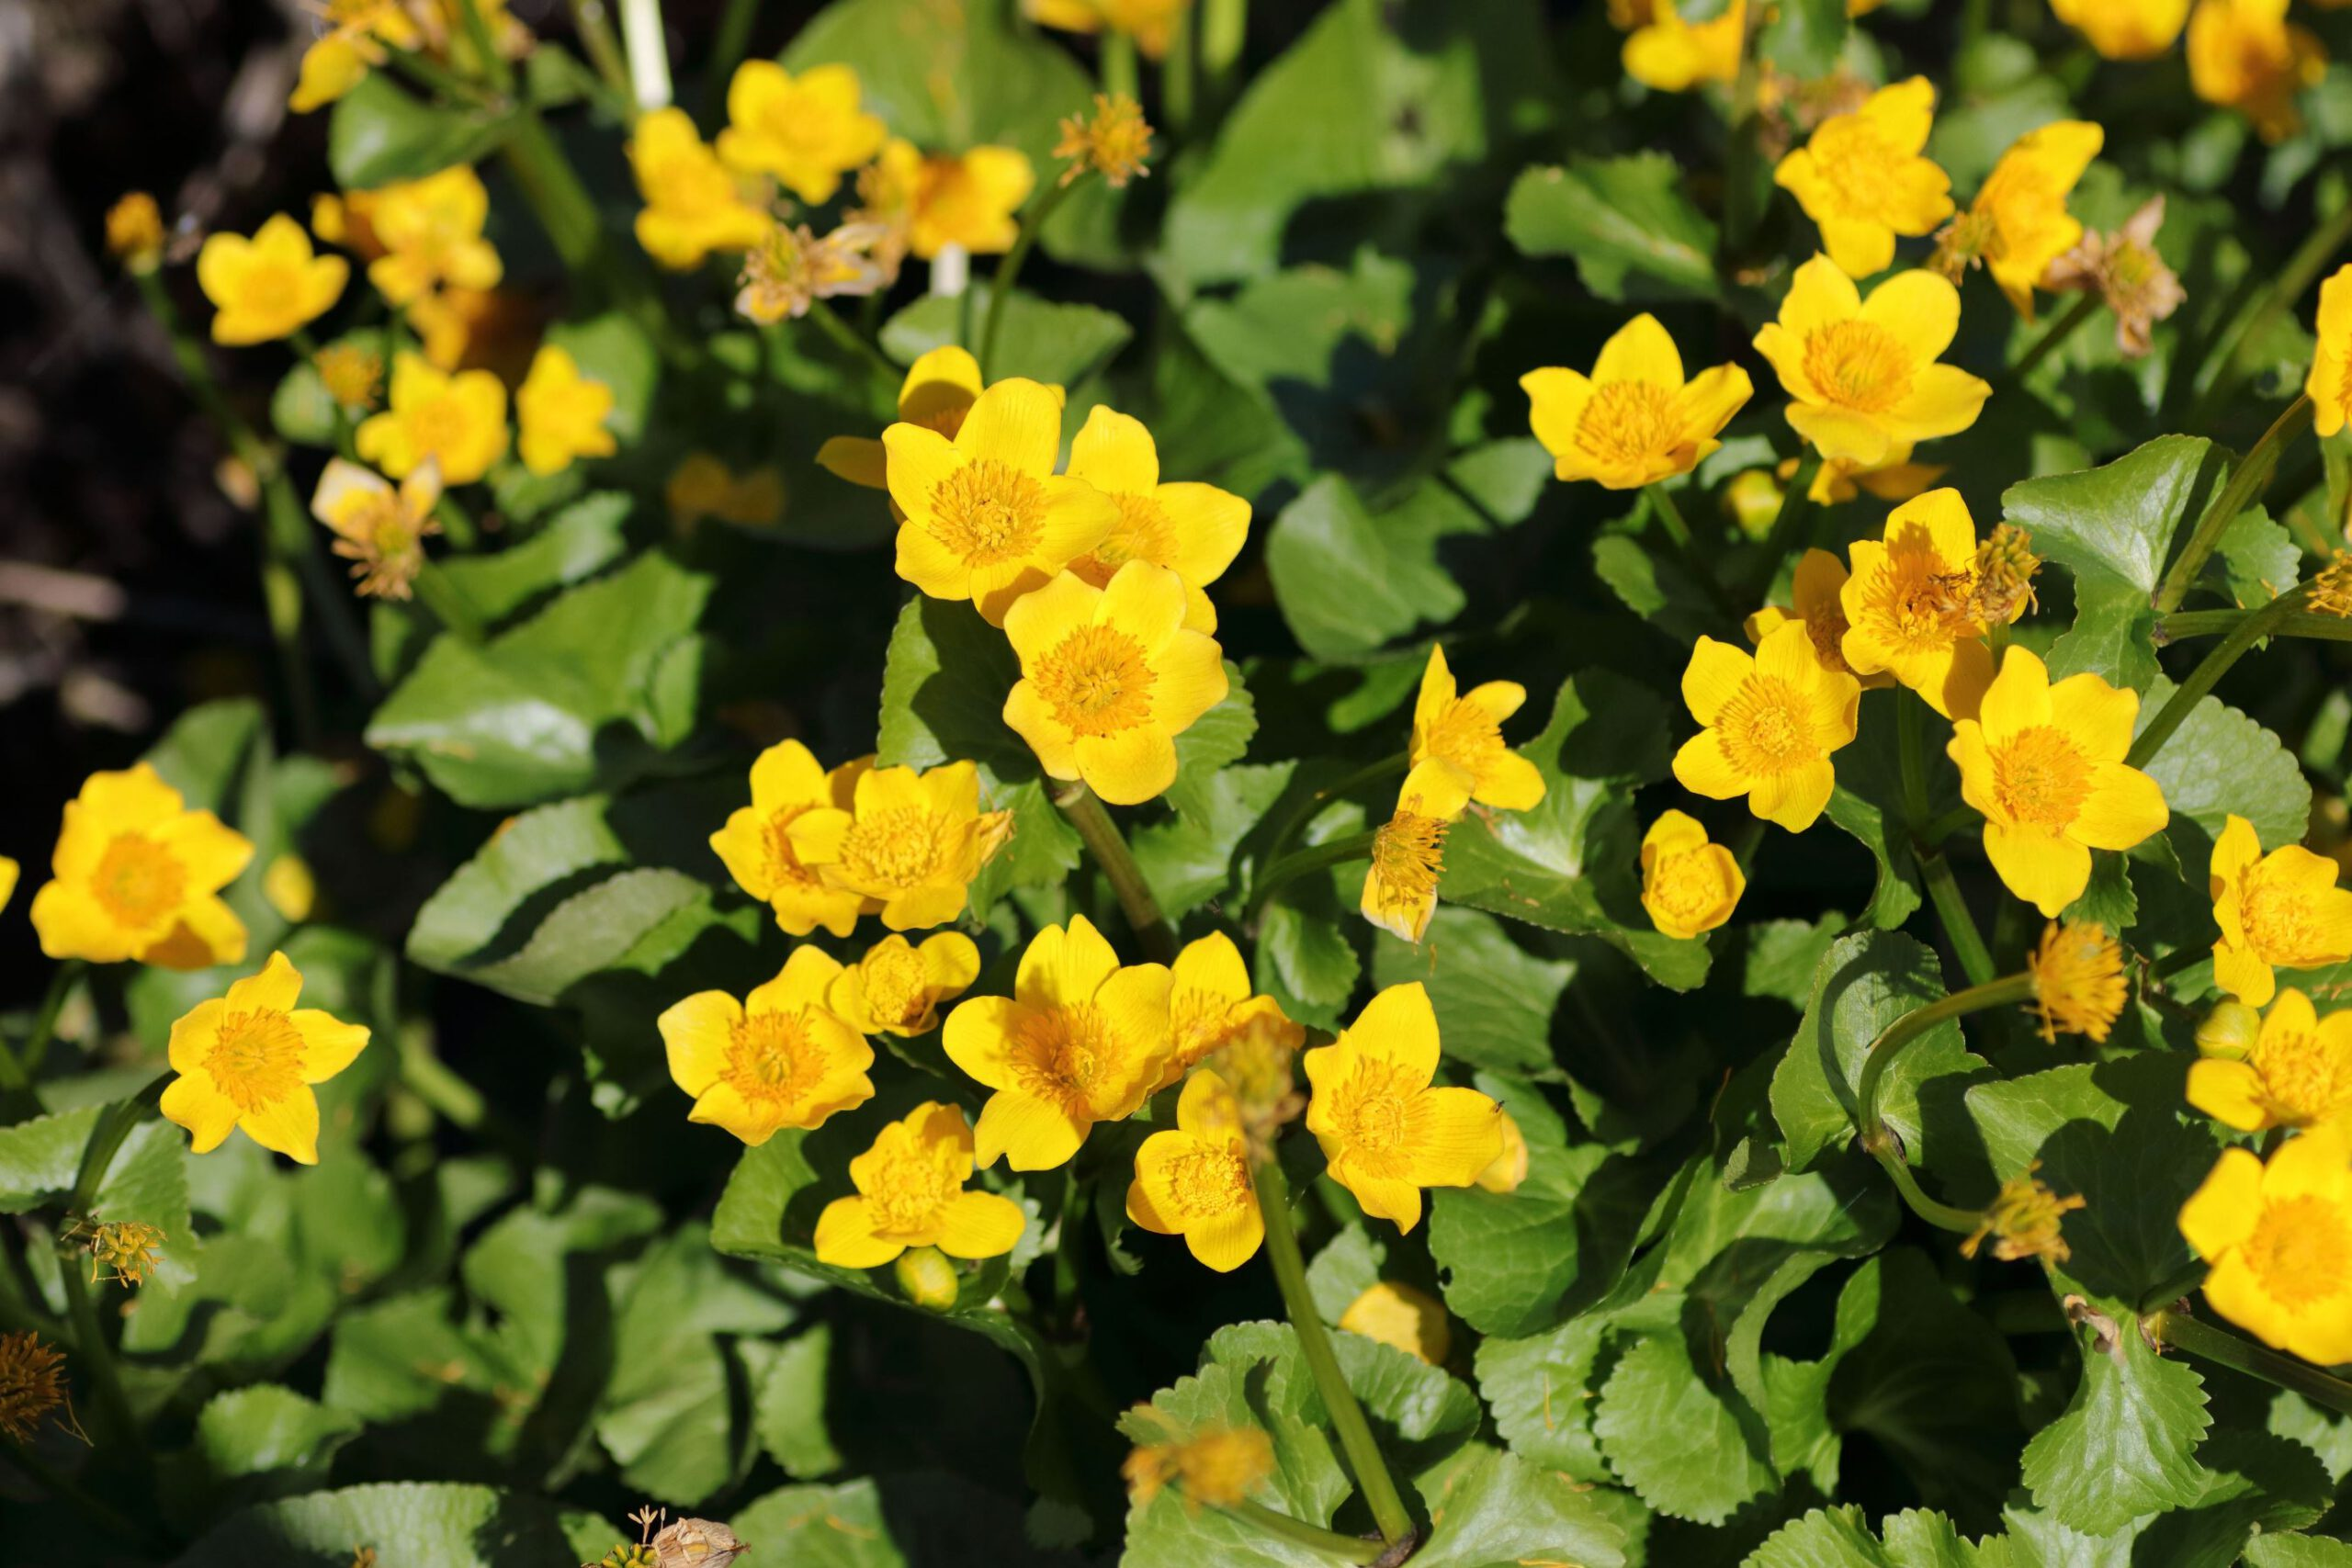 Sumpfdotterblume - Wuchsform der Pflanze